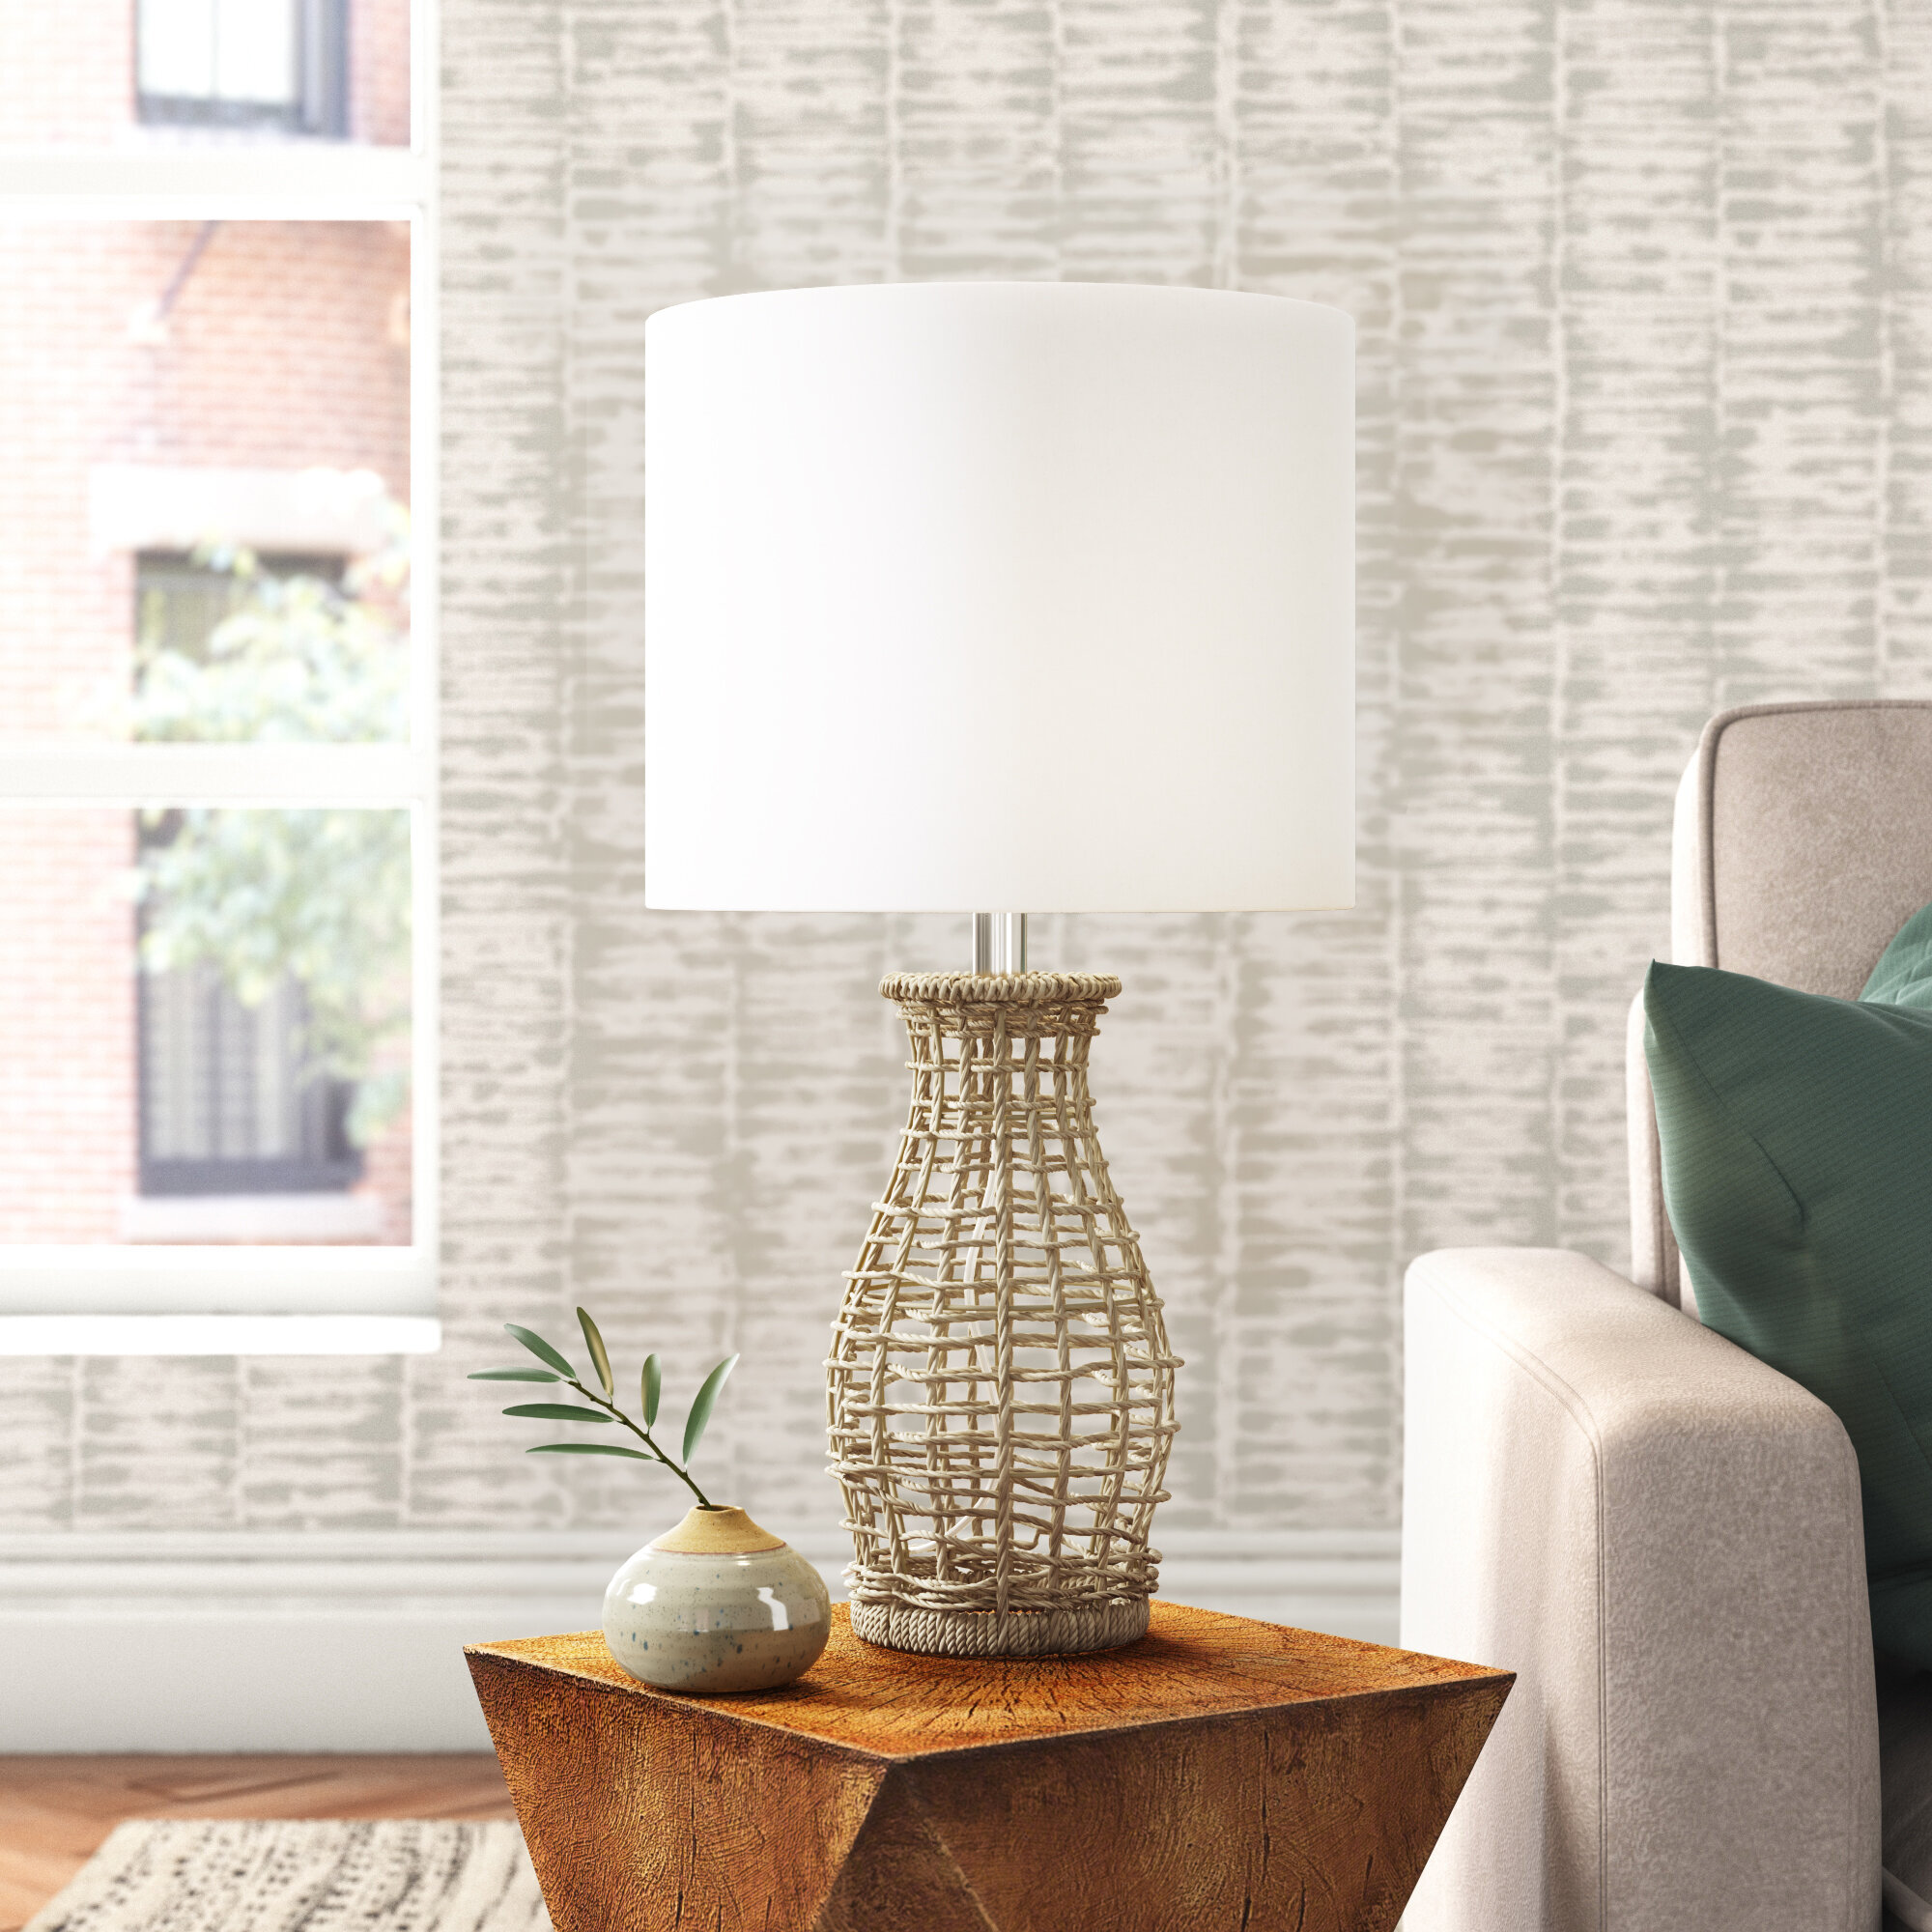 Savell 22 75 Light Natural Table Lamp Reviews Joss Main